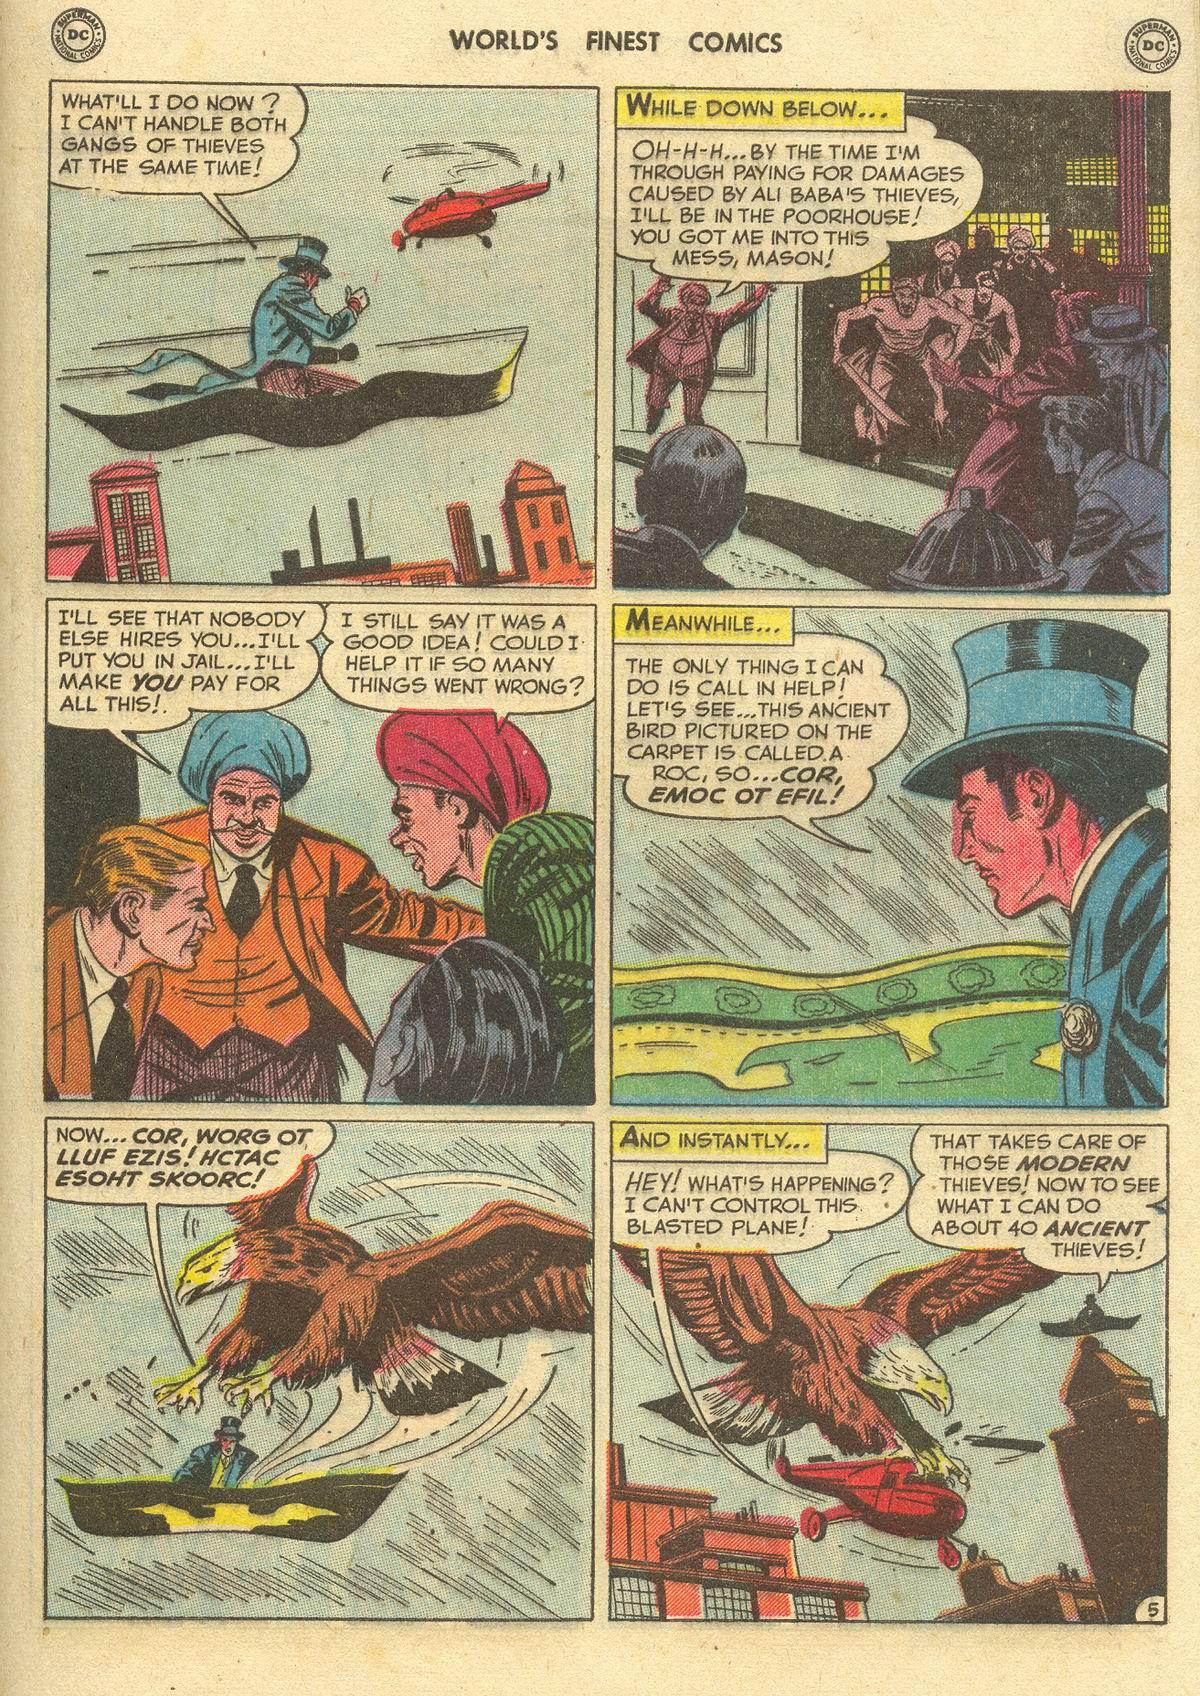 Read online World's Finest Comics comic -  Issue #51 - 59